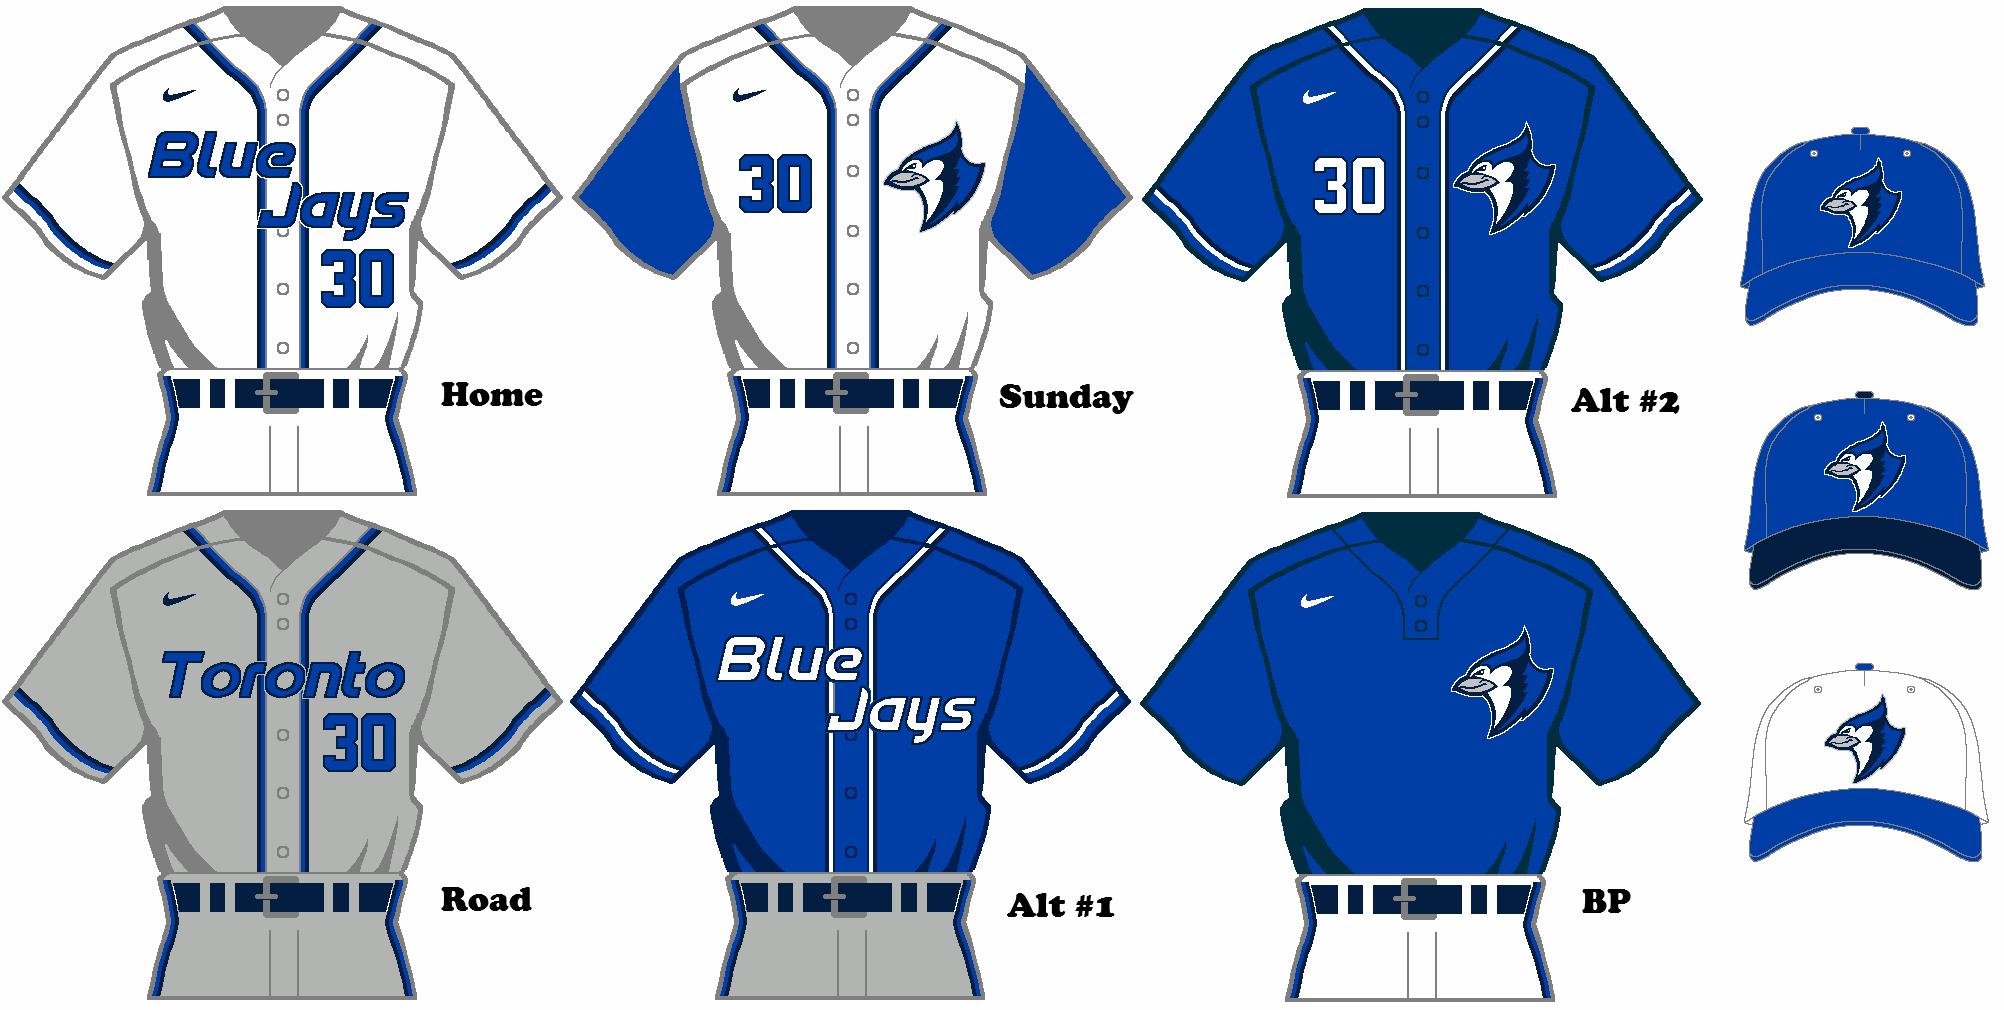 outlet store 1fdd7 04675 Nike MLB Rebrand Concept - Toronto Blue Jays Uniform Set ...